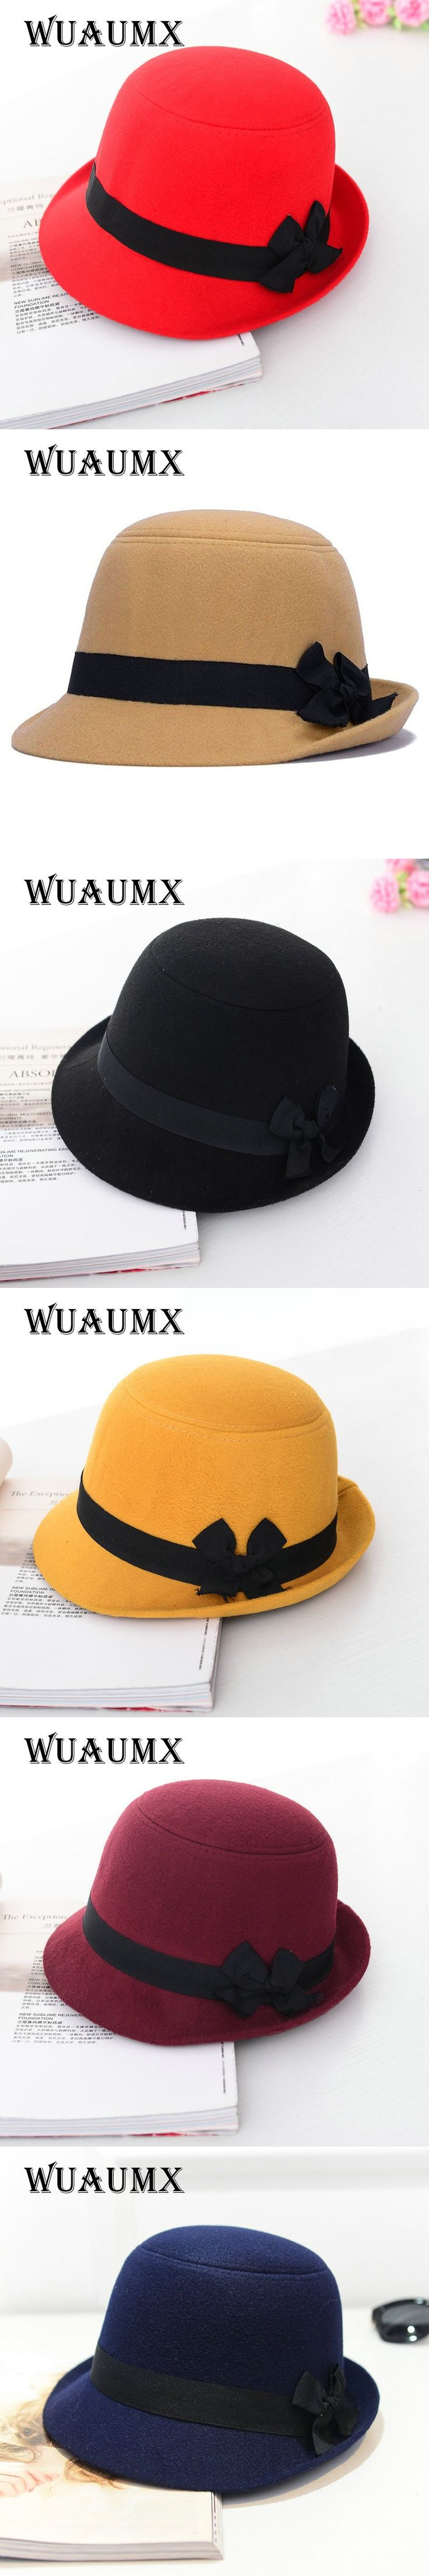 [Wuaumx] Brands Winter Fedora hats for female ladies felt top hat for girls homburg Women's hat Bowler caps chapeu masculino